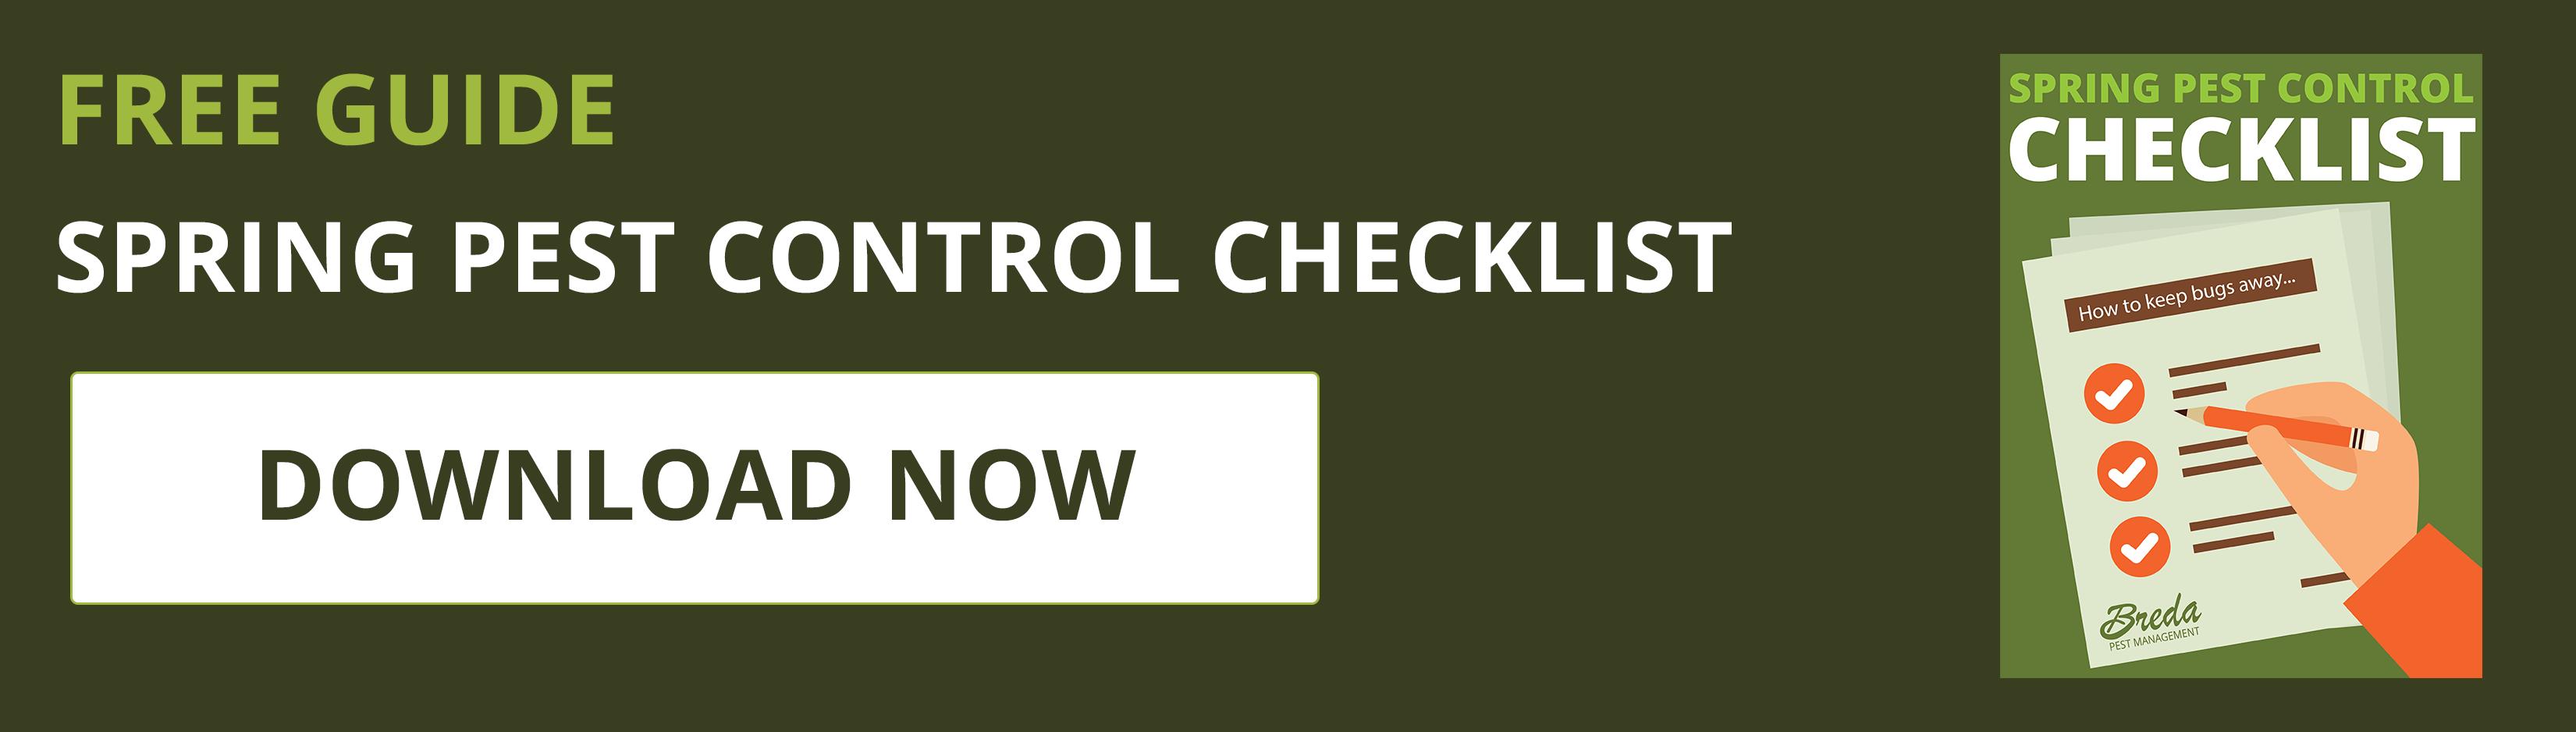 8 steps for do it yourself diy pest control breda pest management solutioingenieria Image collections